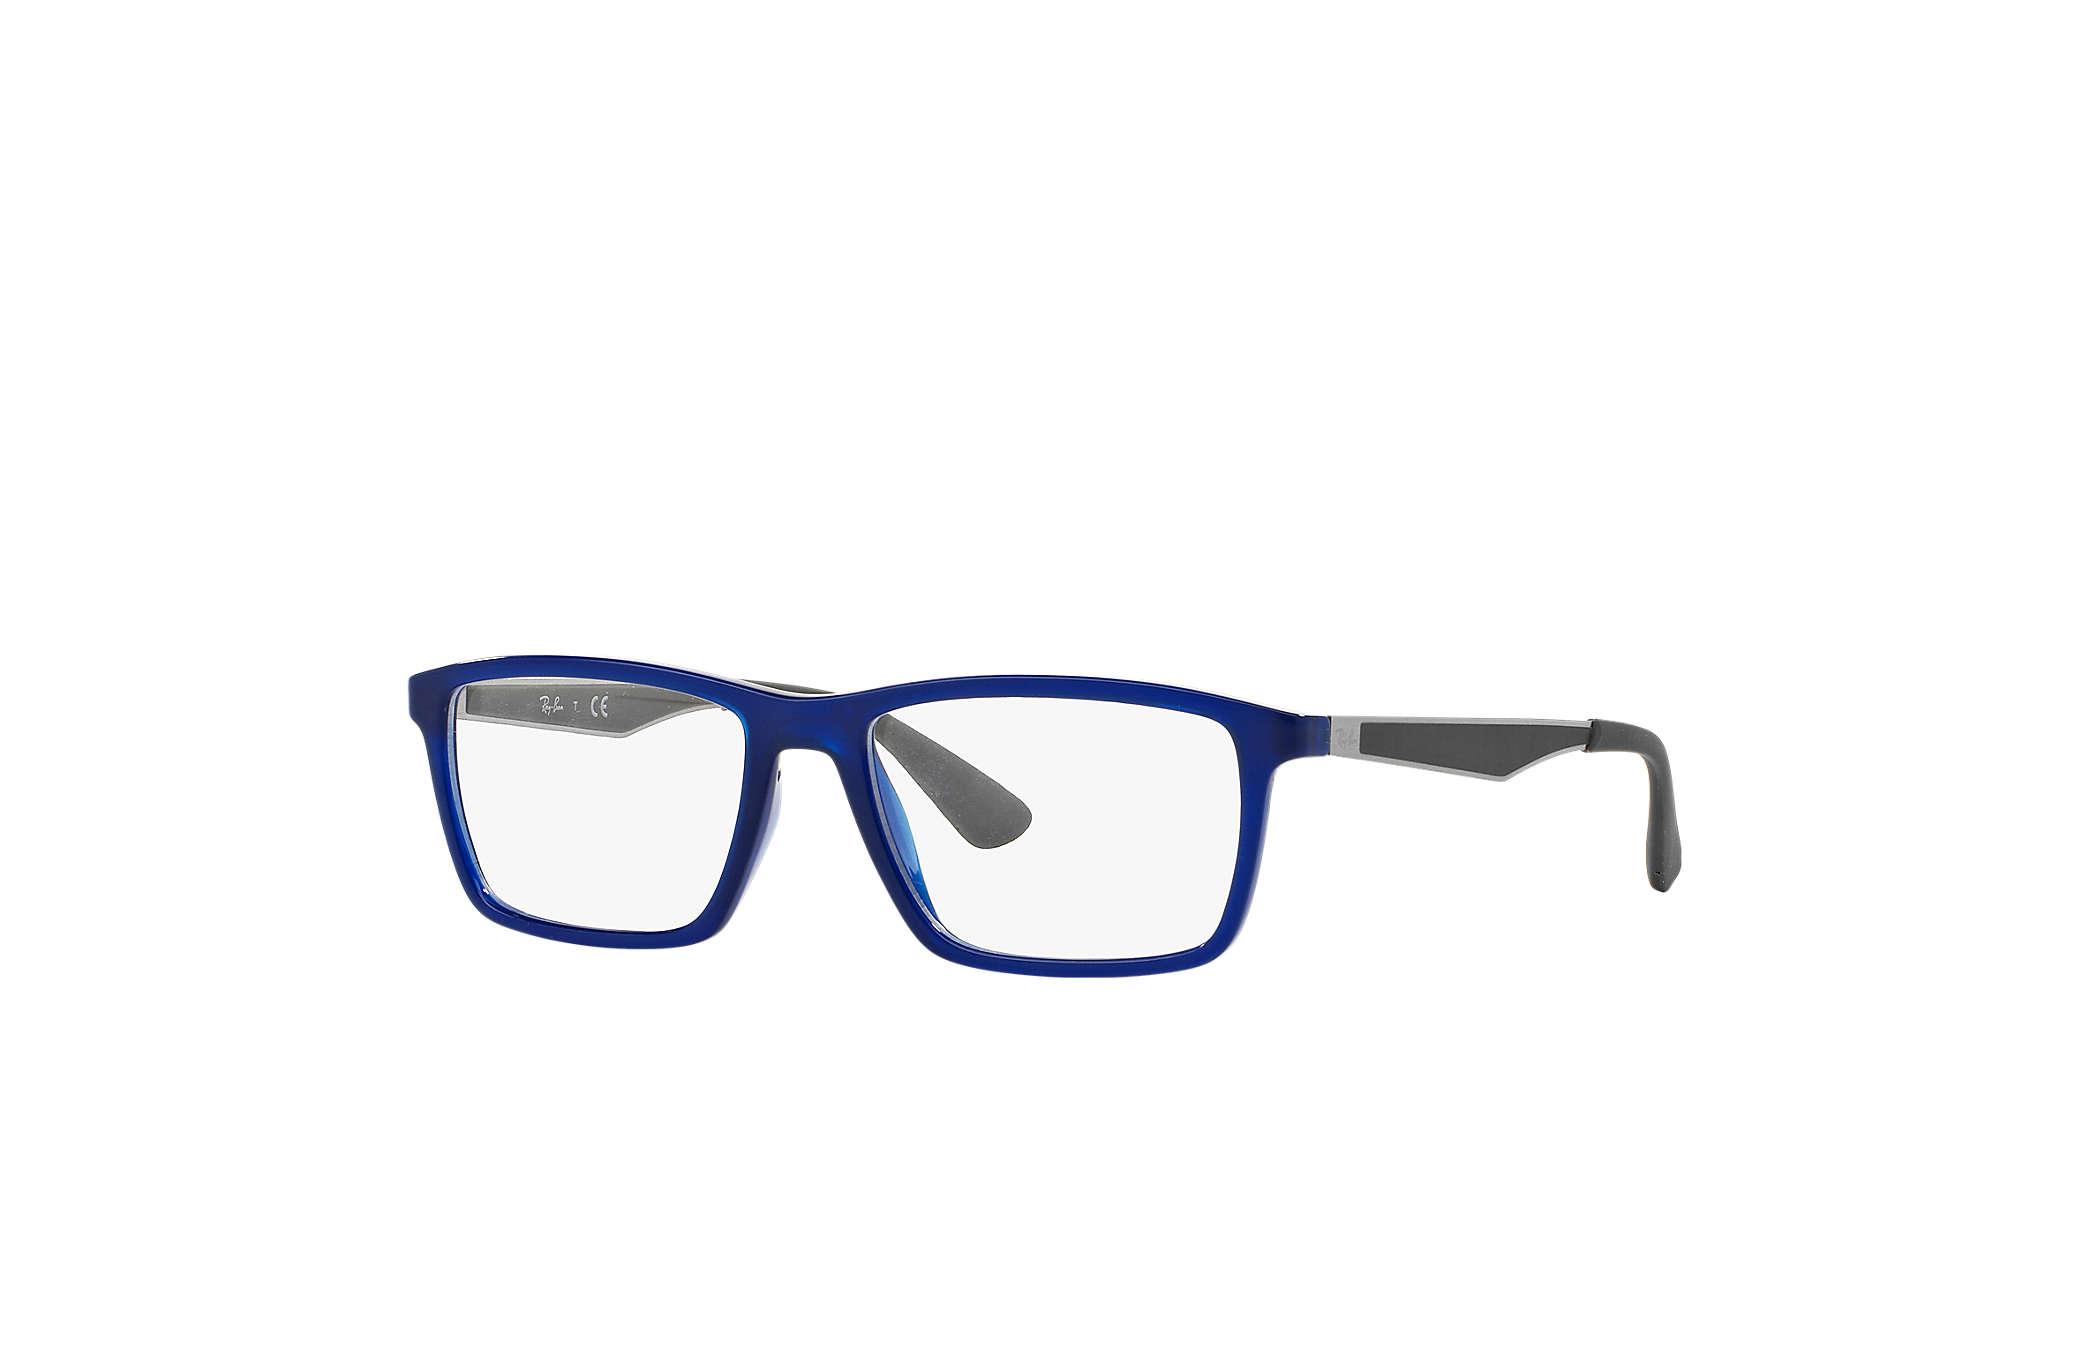 461cad79c3 Ray-Ban prescription glasses RB7056 Blue - Nylon - 0RX7056539353 ...